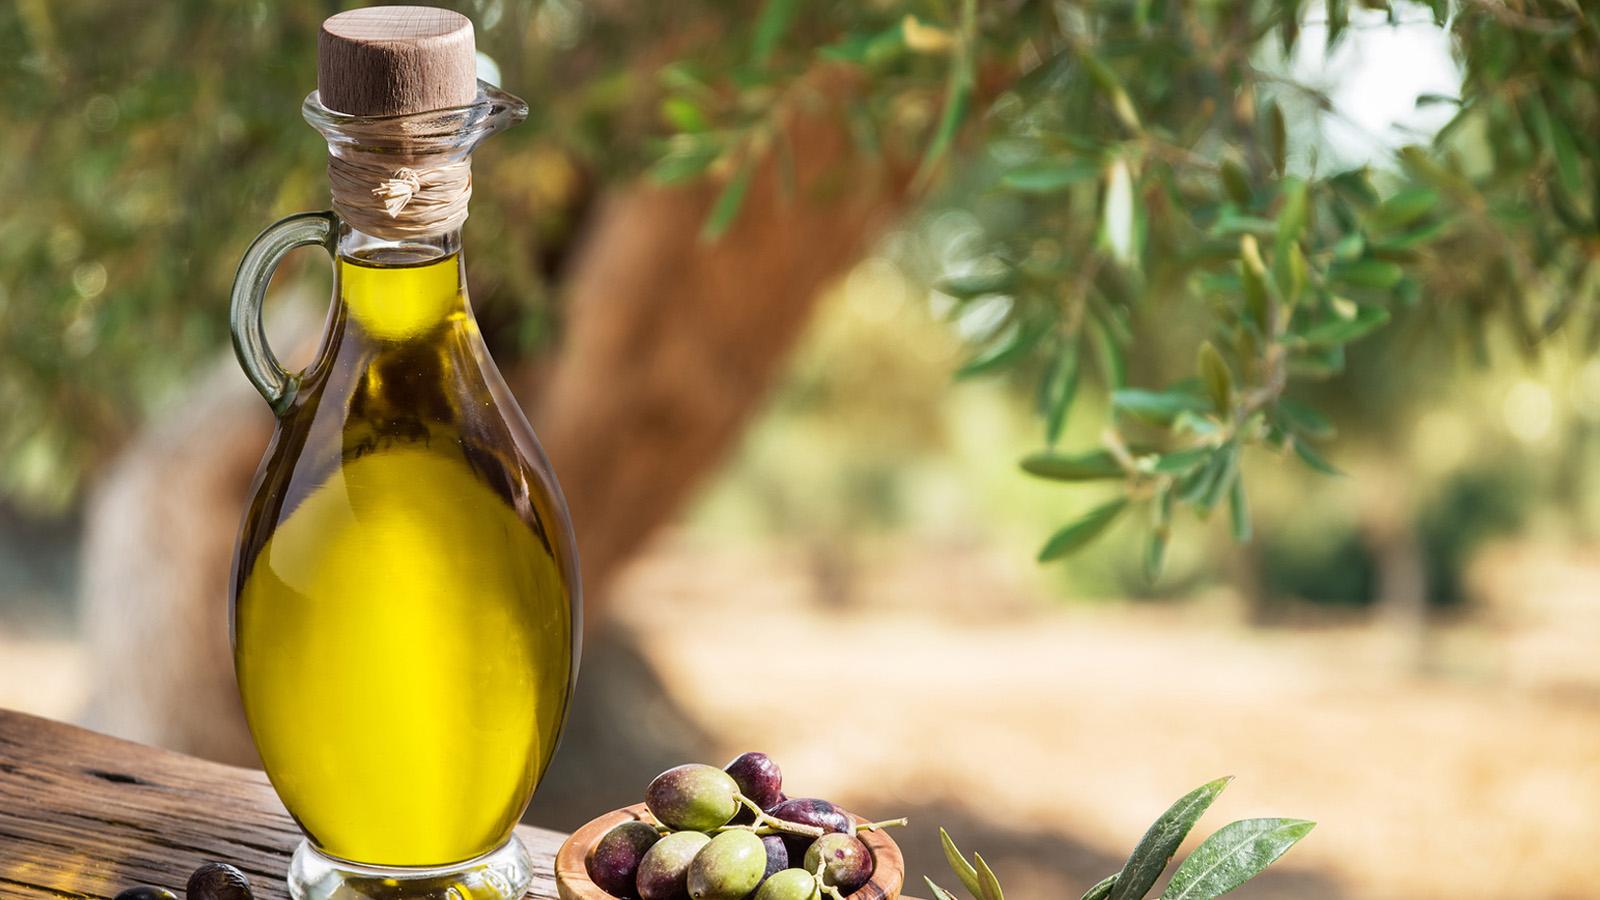 A bottle of extra virgin olive oil